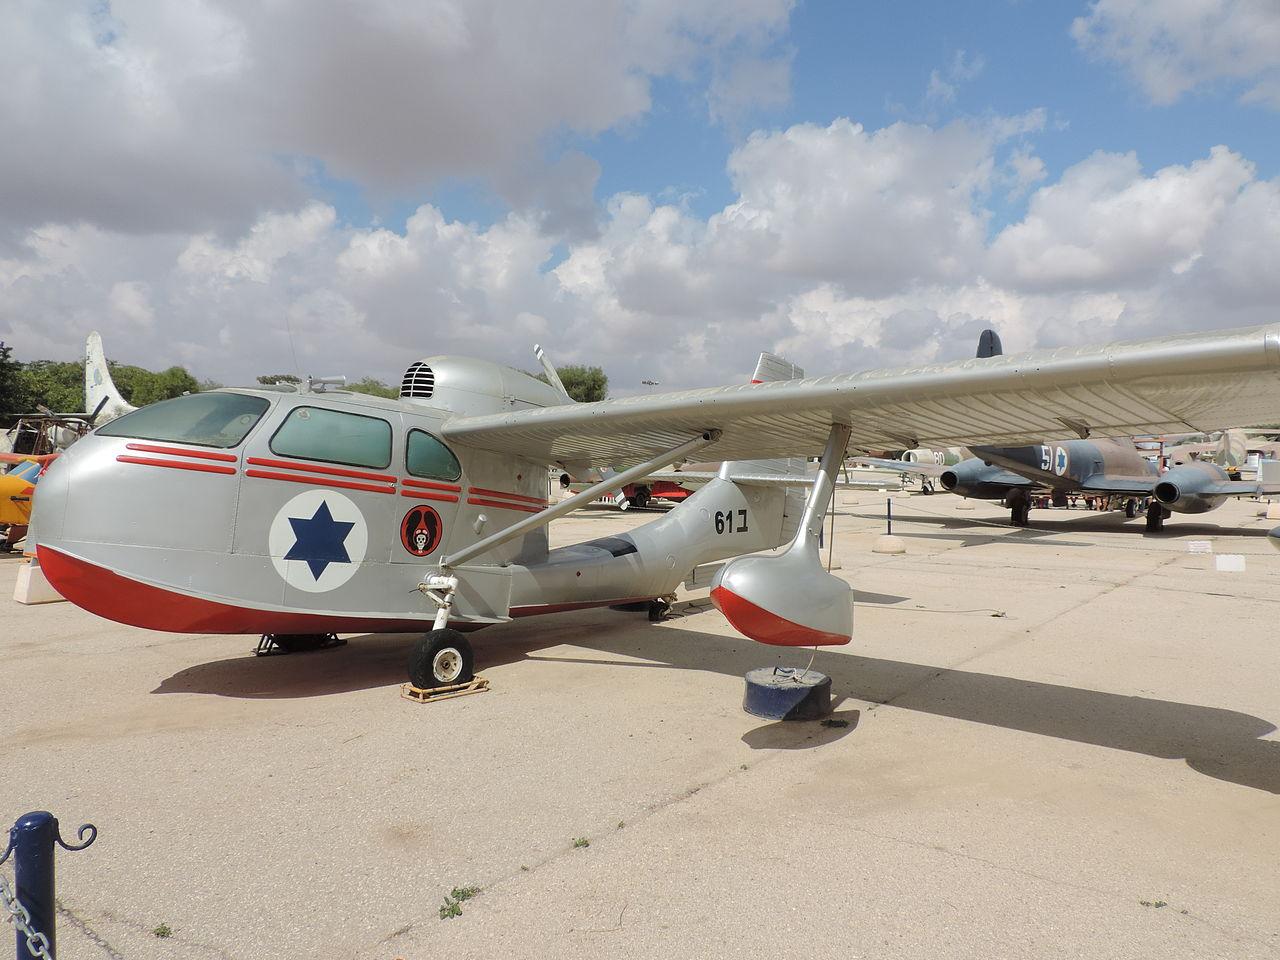 1280px-Republic_RC-3_Seabee_IAF_museum.jpg